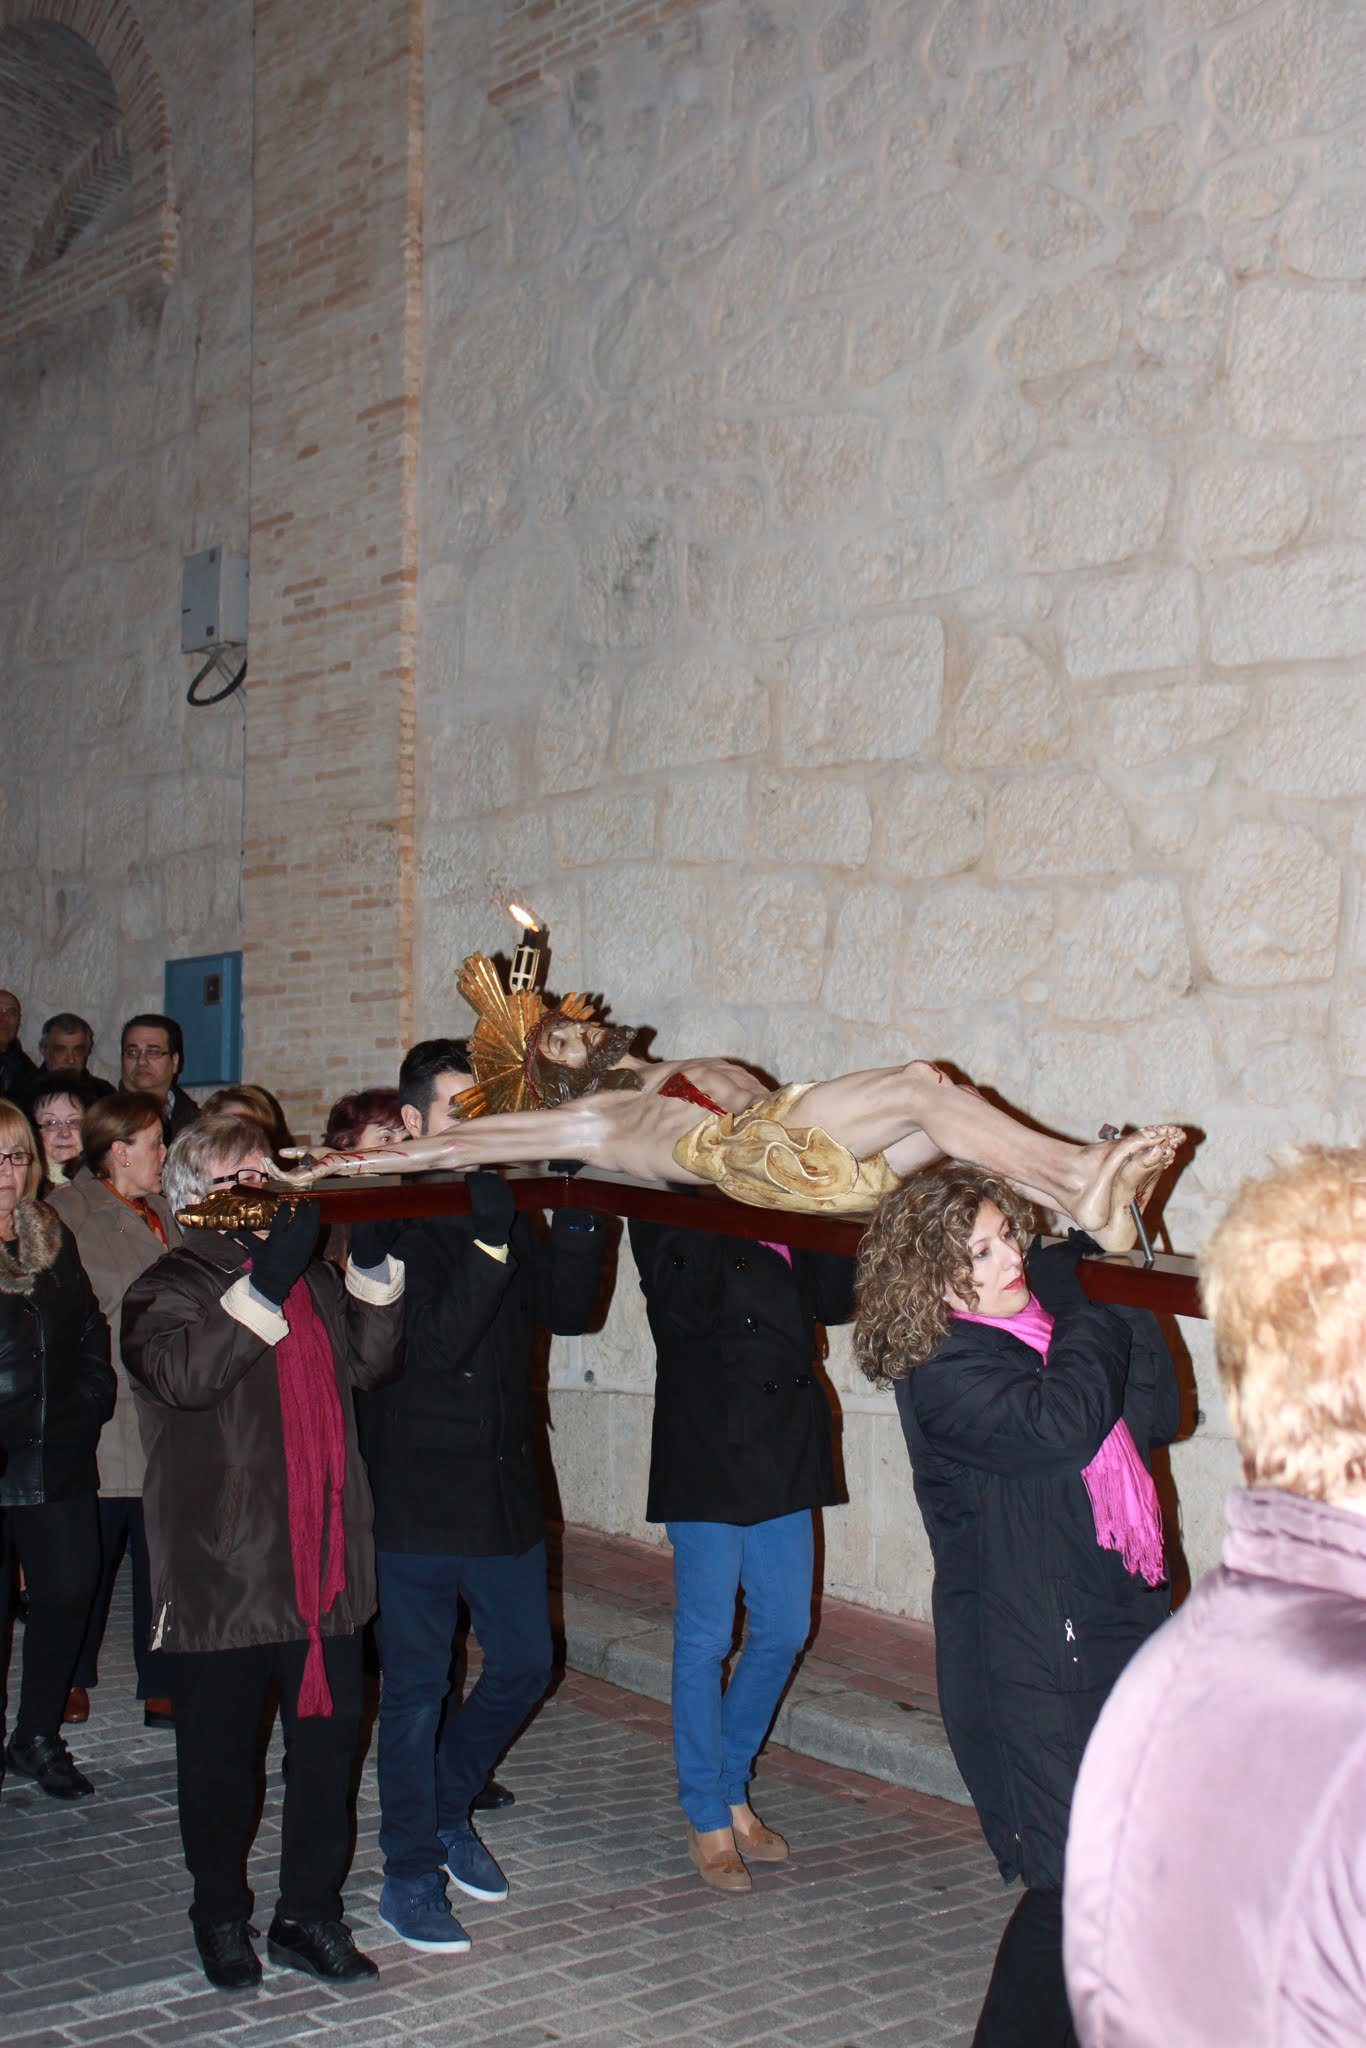 (2013-03-22) - IV Vía Crucis nocturno - Javier Romero Ripoll (99)